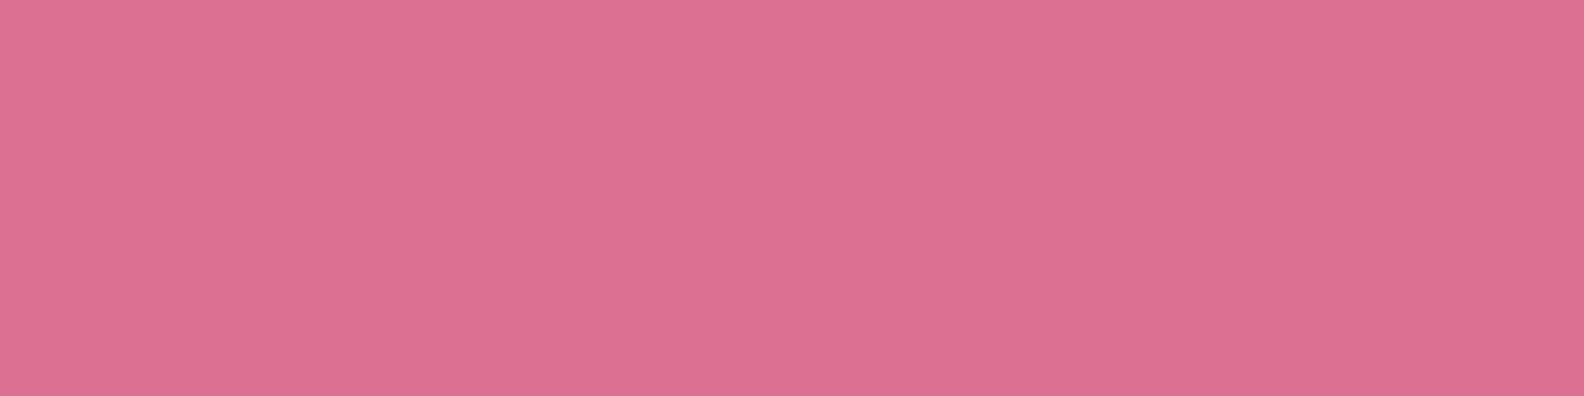 1584x396 Pale Red-violet Solid Color Background